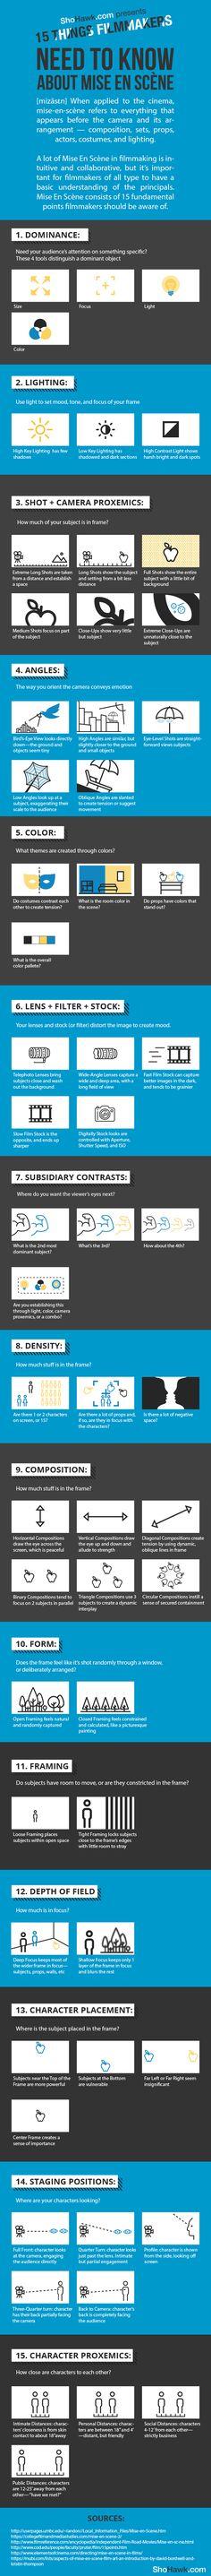 Learn 15 Key Elements of Mise en Scene from This Handy Infographic In dieser praktischen Infografik lernen Sie 15 Hauptelemente von Mise en Scene Beau Film, Film Class, Film Tips, Films Cinema, Photographer Needed, Film Studies, Media Studies, Digital Film, Photoshop